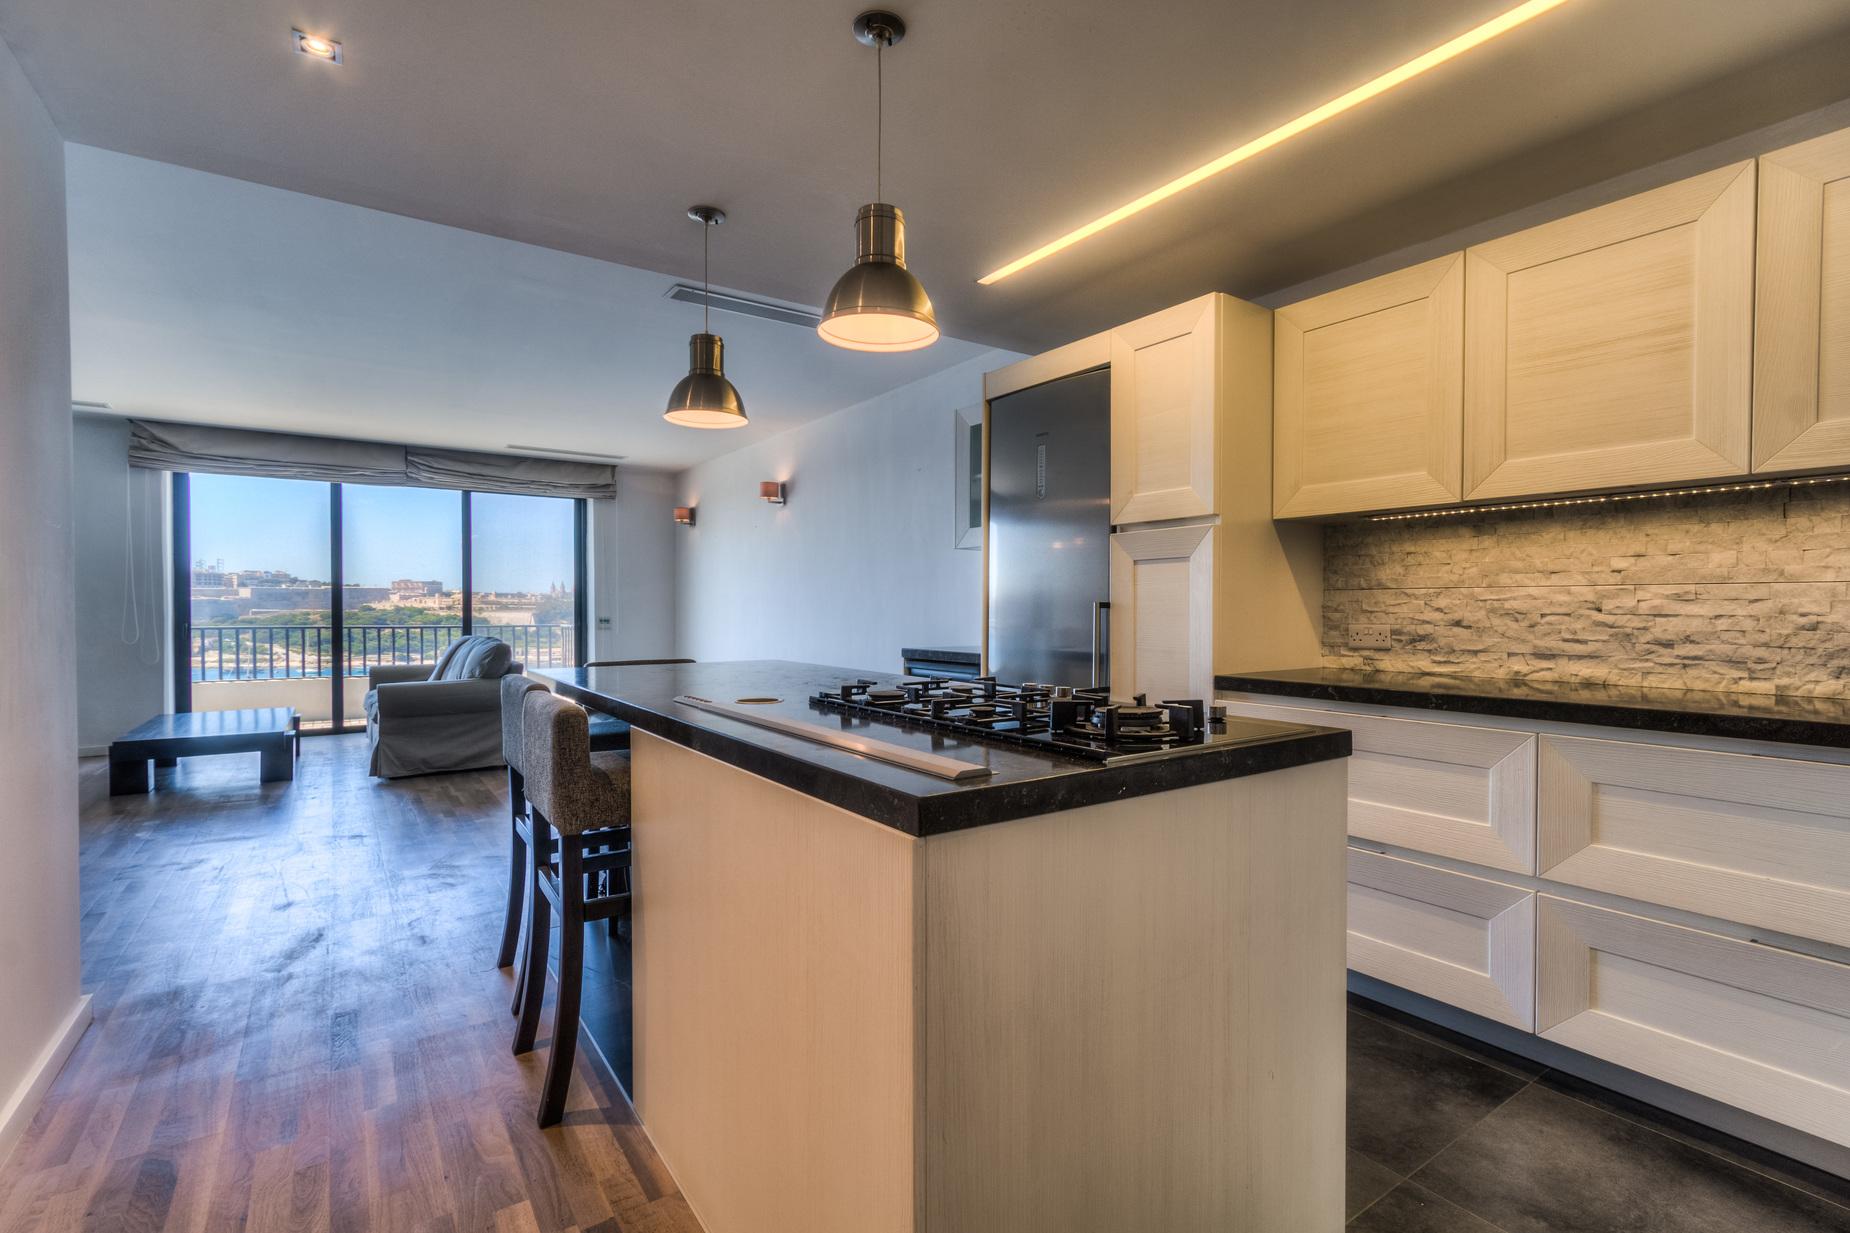 3 bed Apartment For Rent in Sliema, Sliema - thumb 5